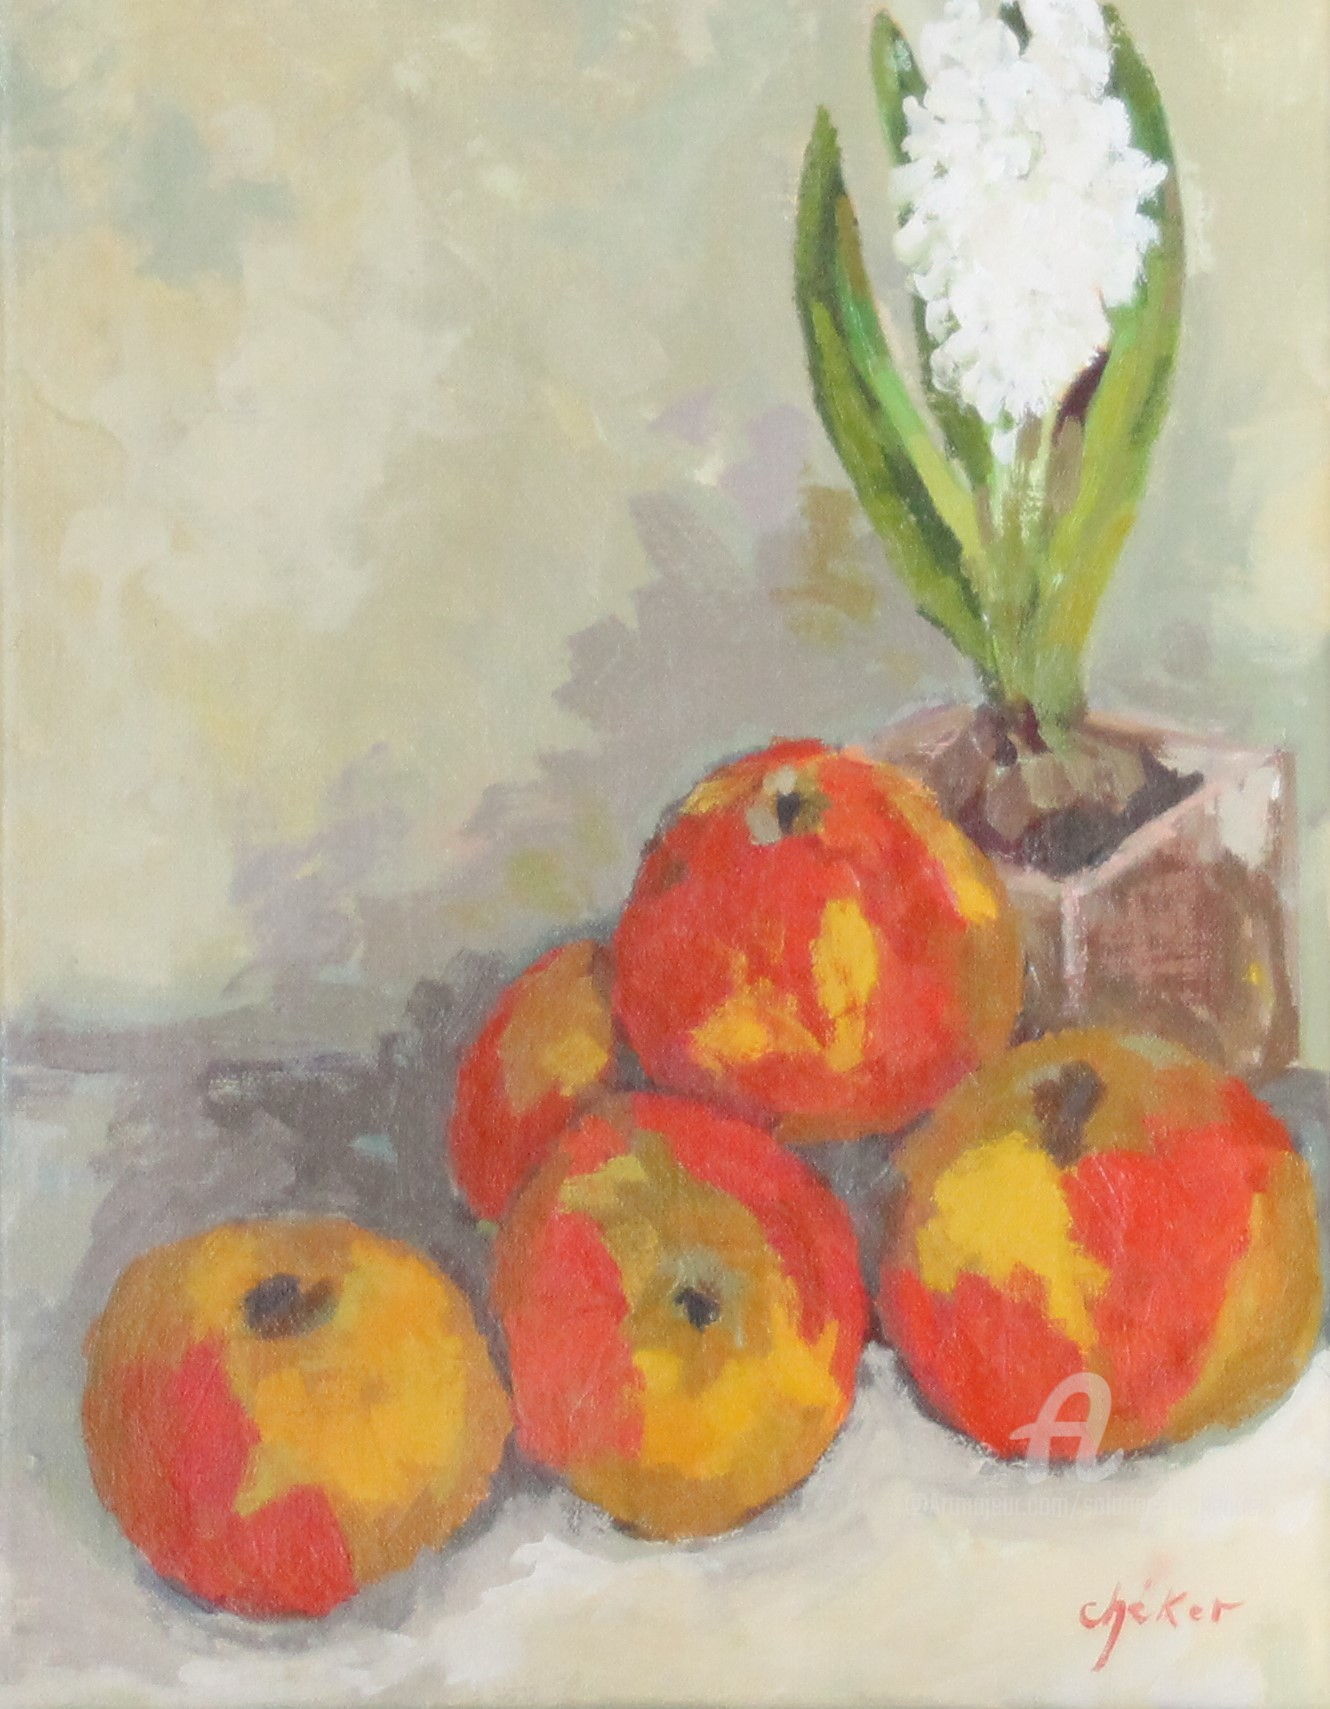 Chéker - Jacinthe et pommes